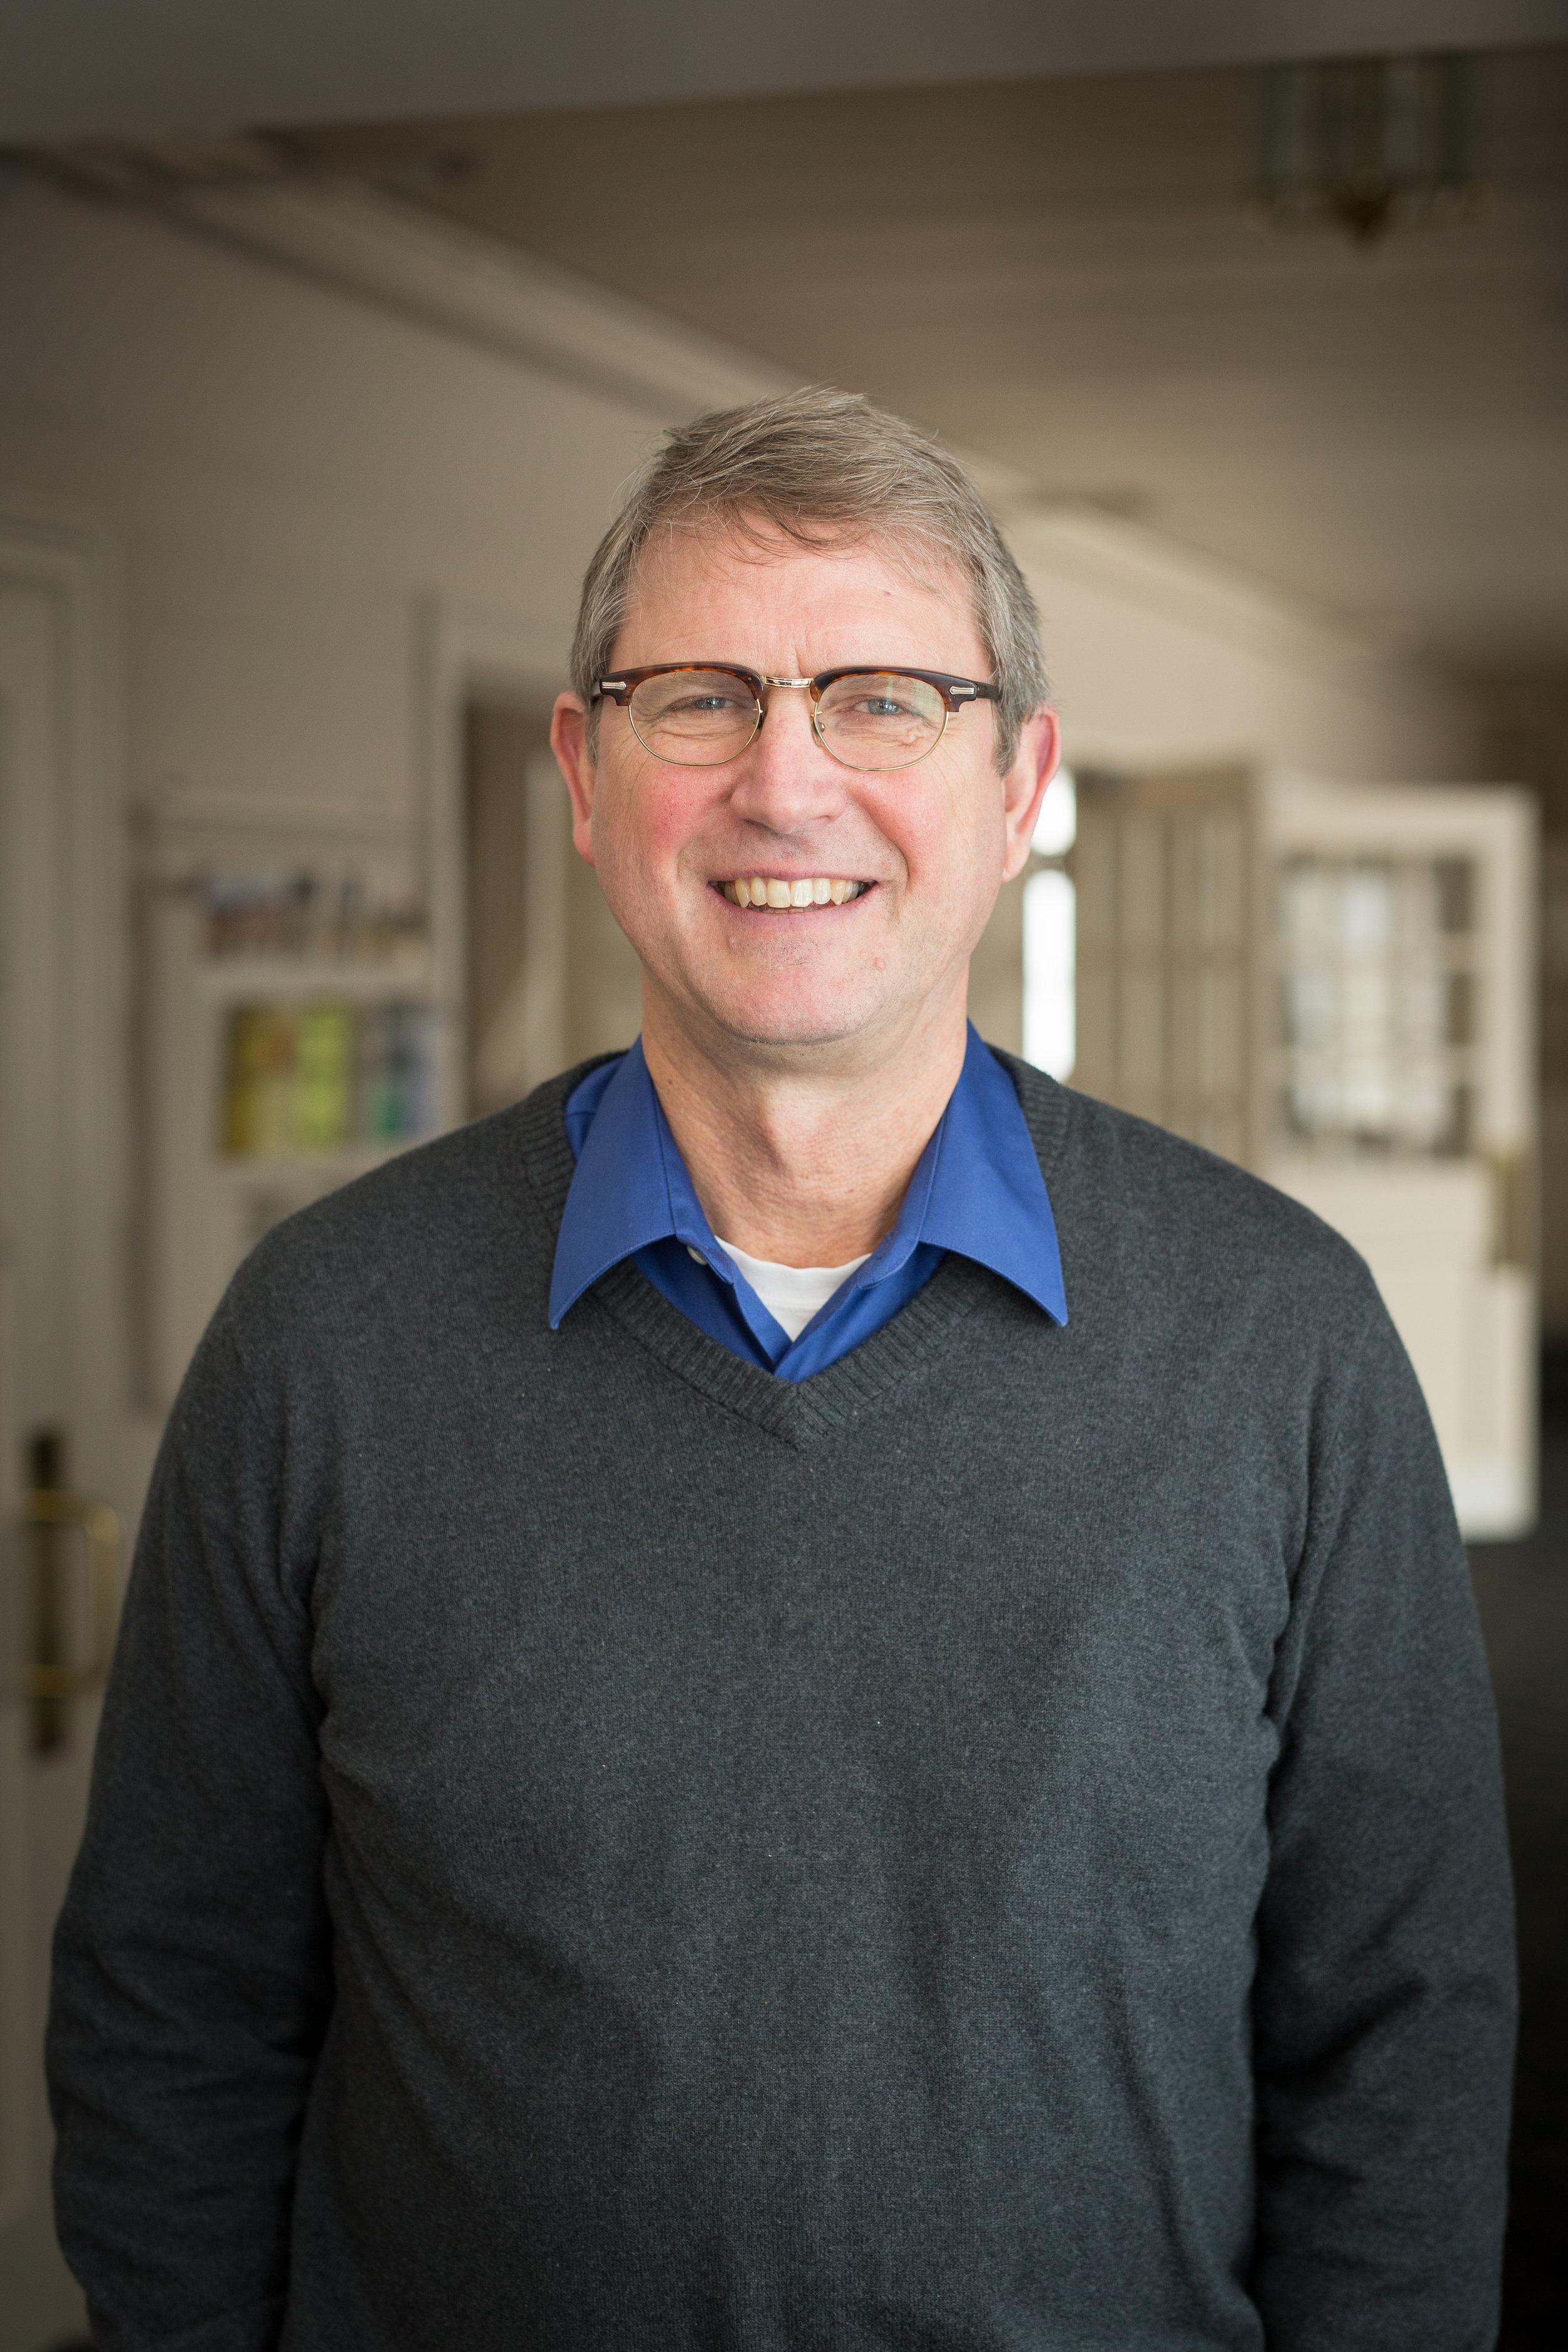 Gerry Koning Lead Pastor